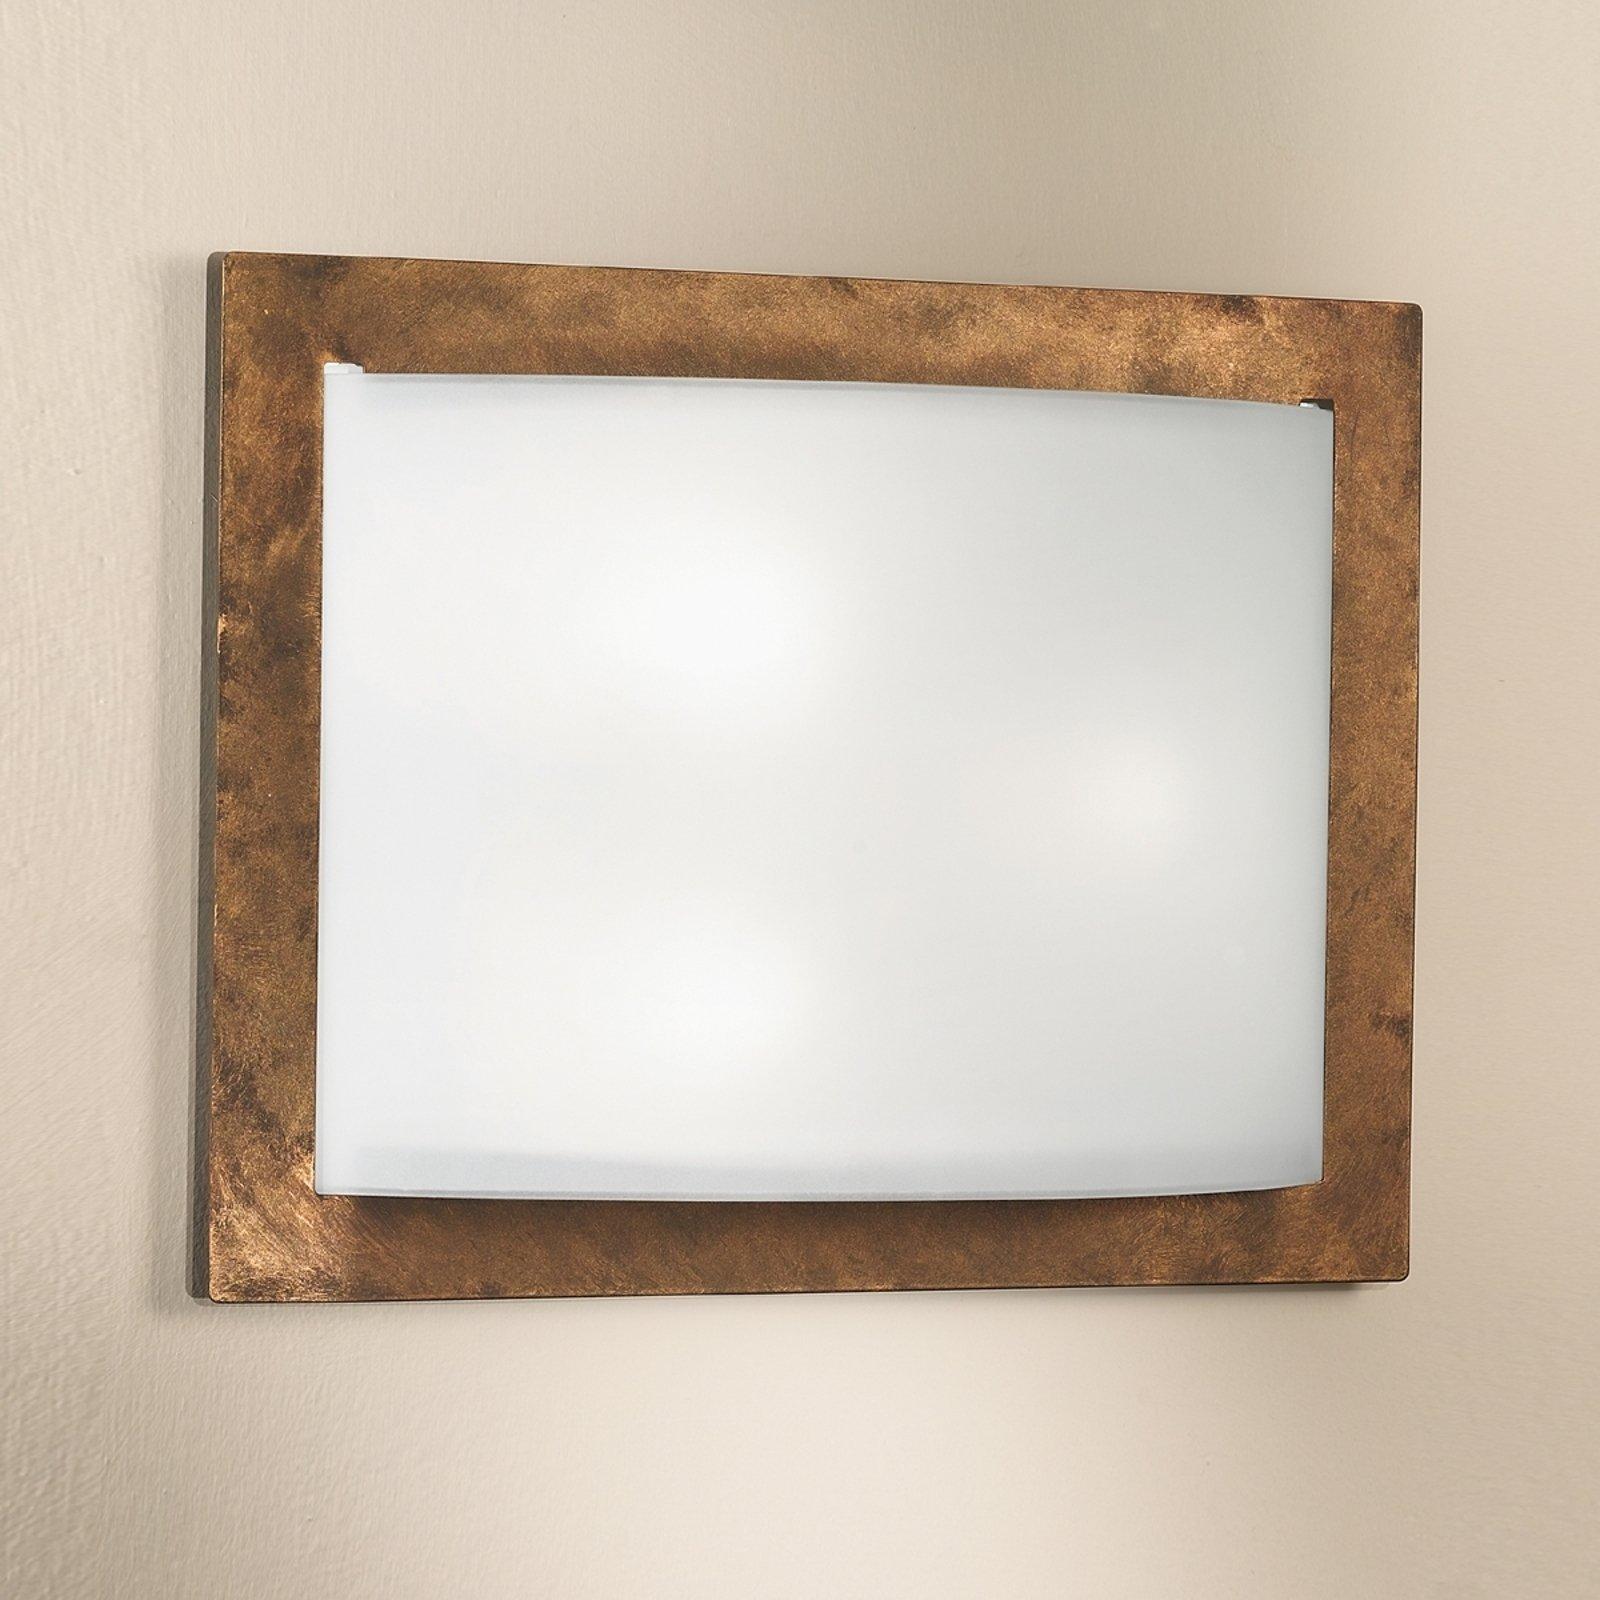 Vegglampe Metwally, rust, 37 x 49 cm